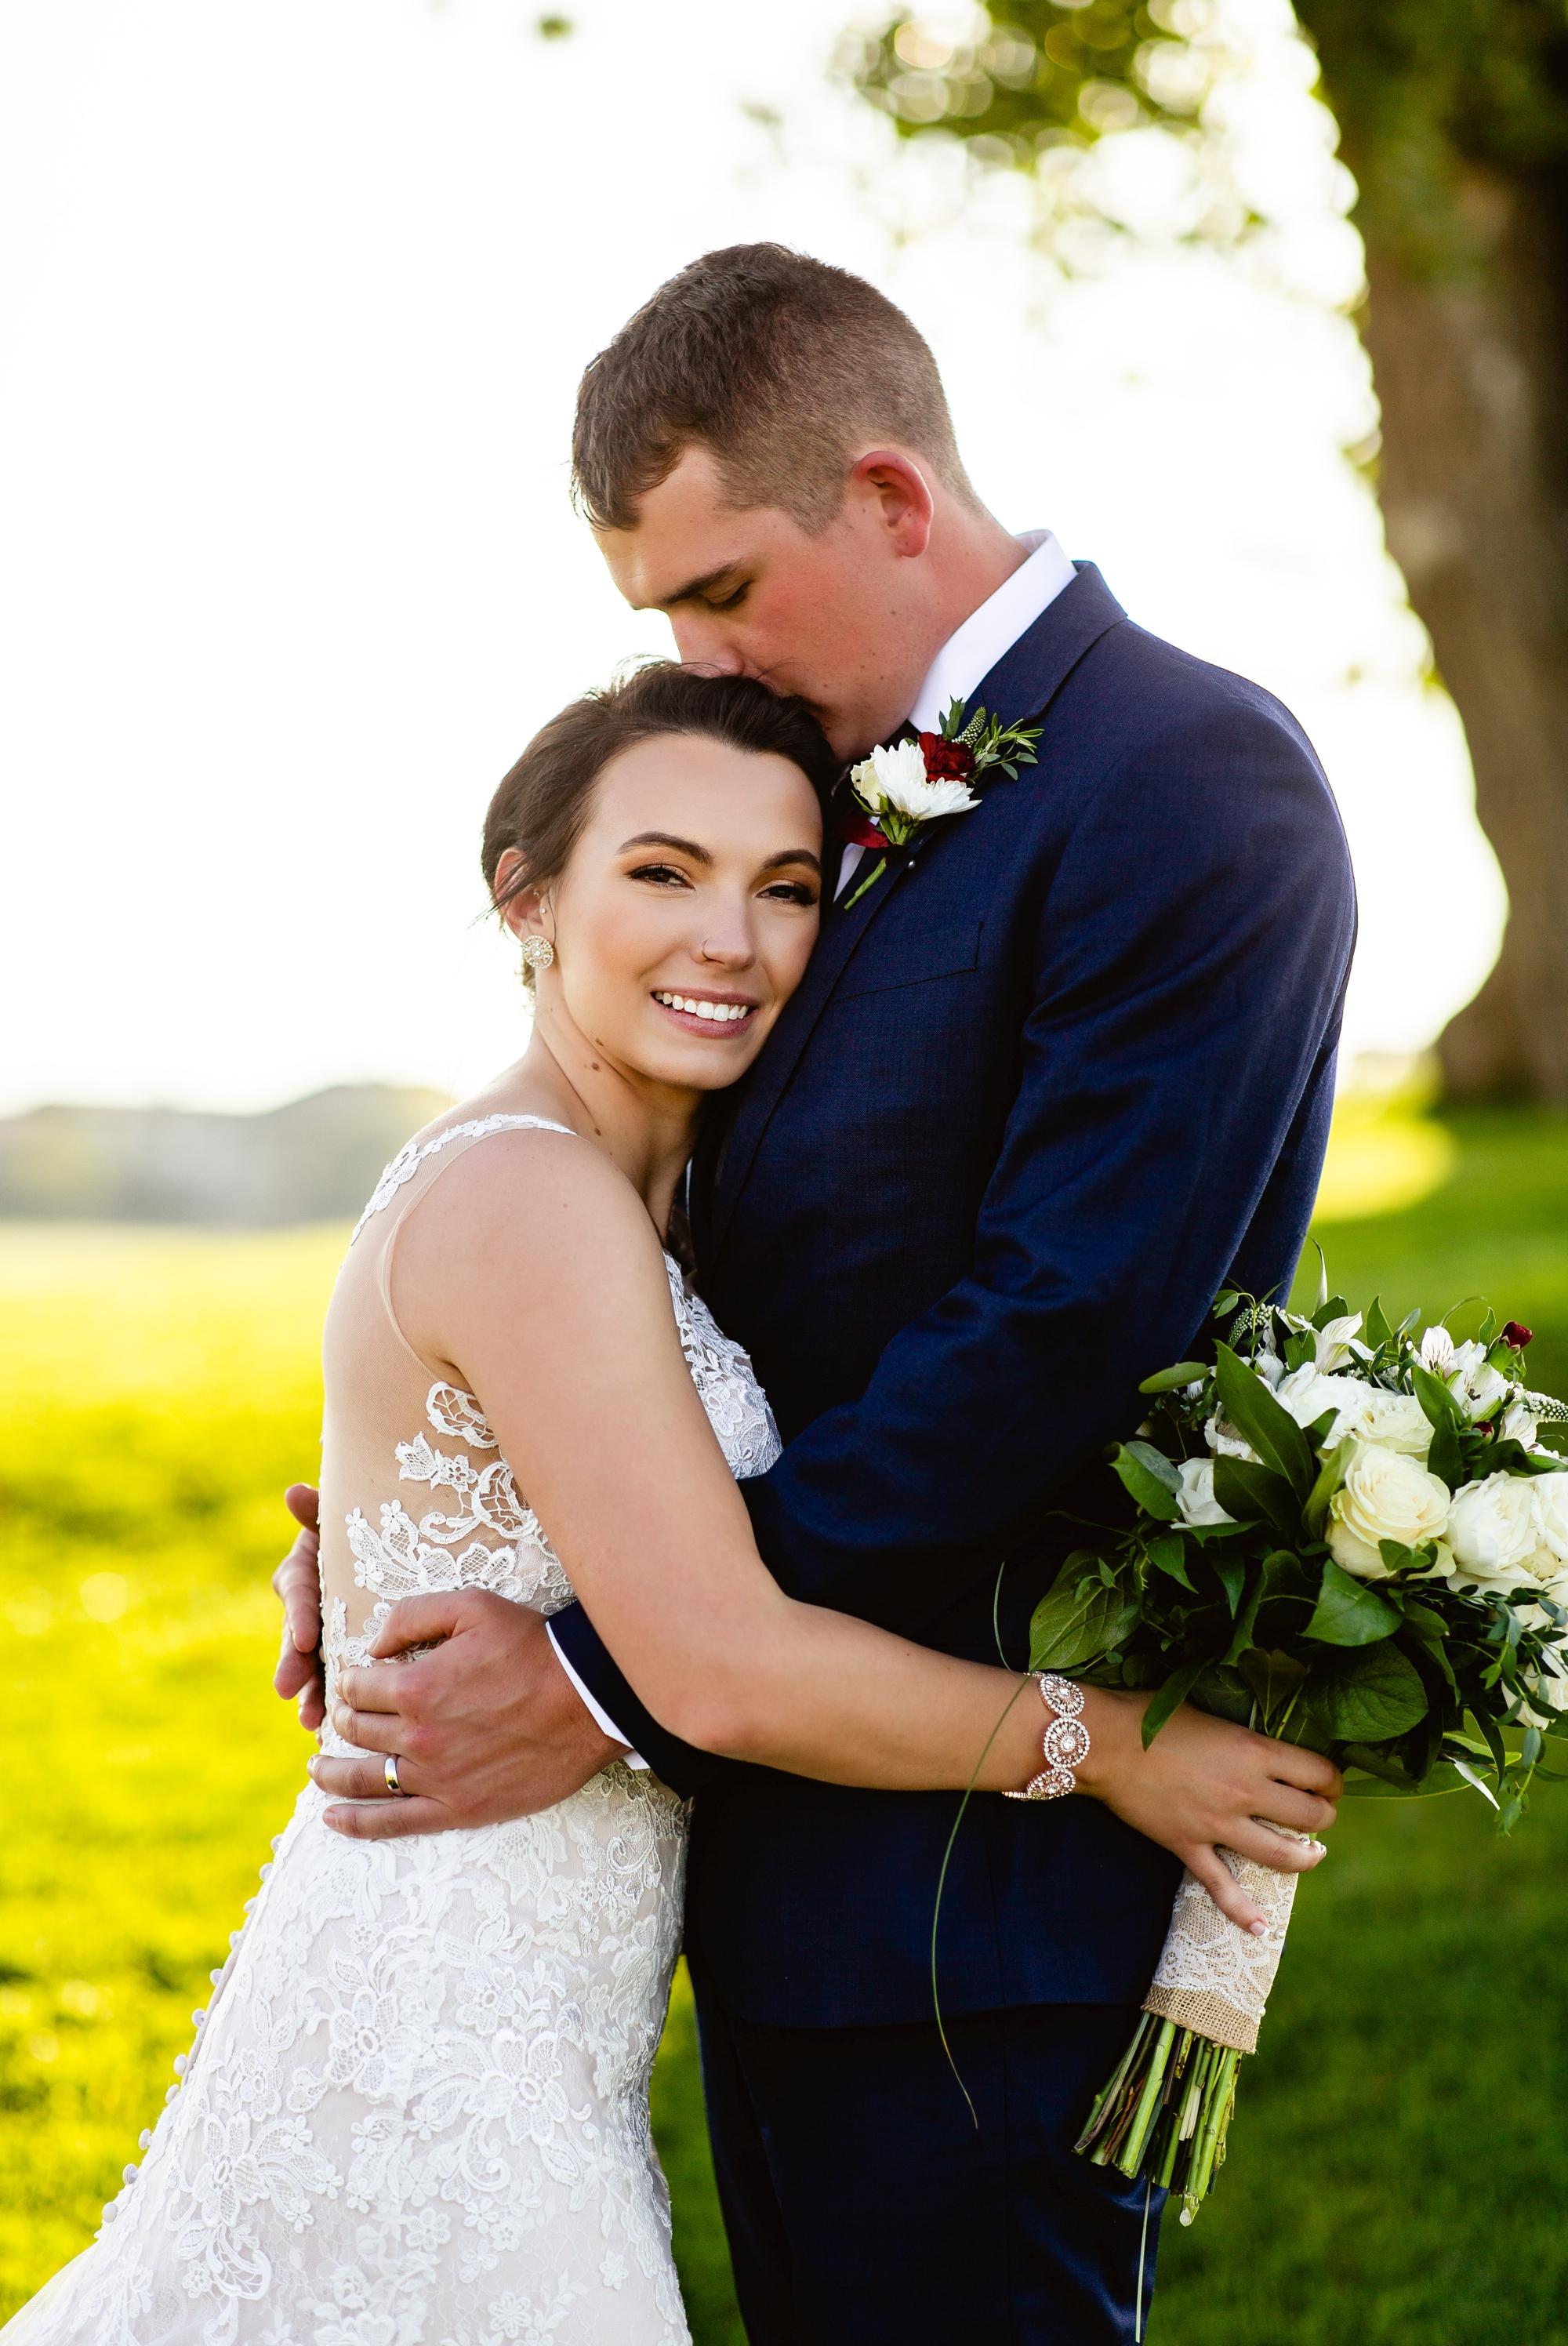 Windsor Big Red Barn Wedding in 2020 | Colorado wedding ...